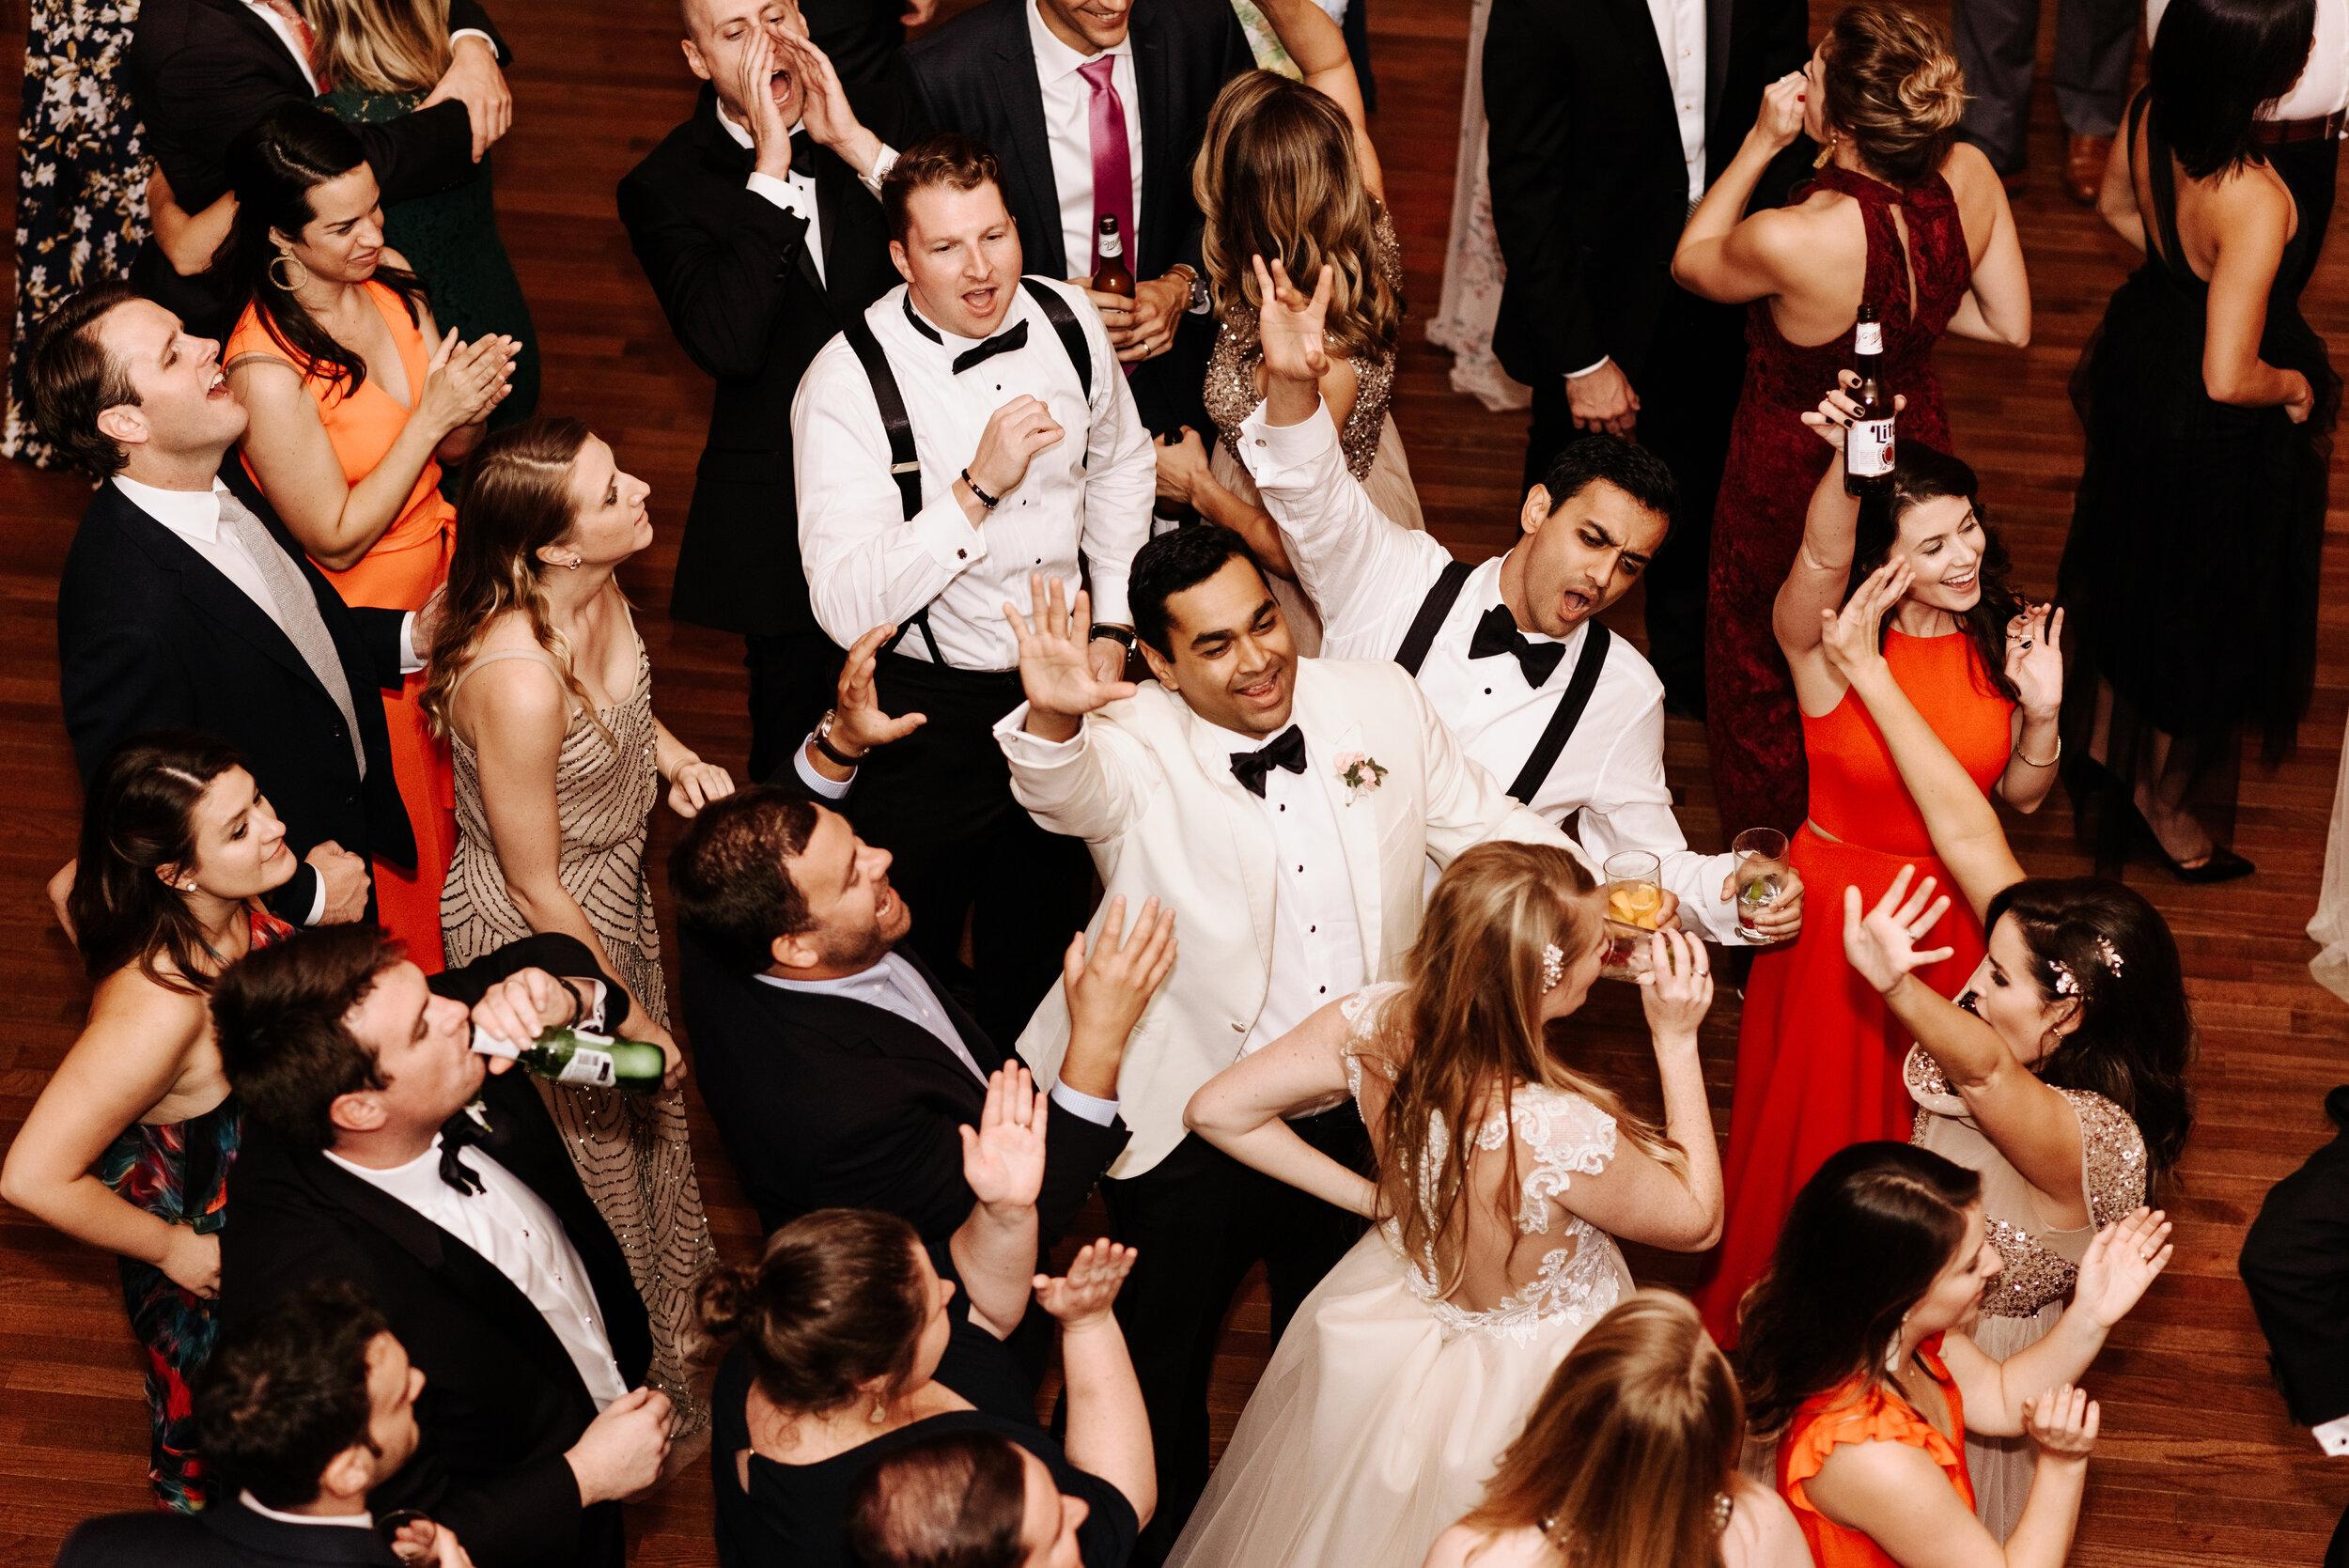 Cassie-Mrunal-Wedding-Quirk-Hotel-John-Marshall-Ballrooms-Richmond-Virginia-Photography-by-V-116.jpg